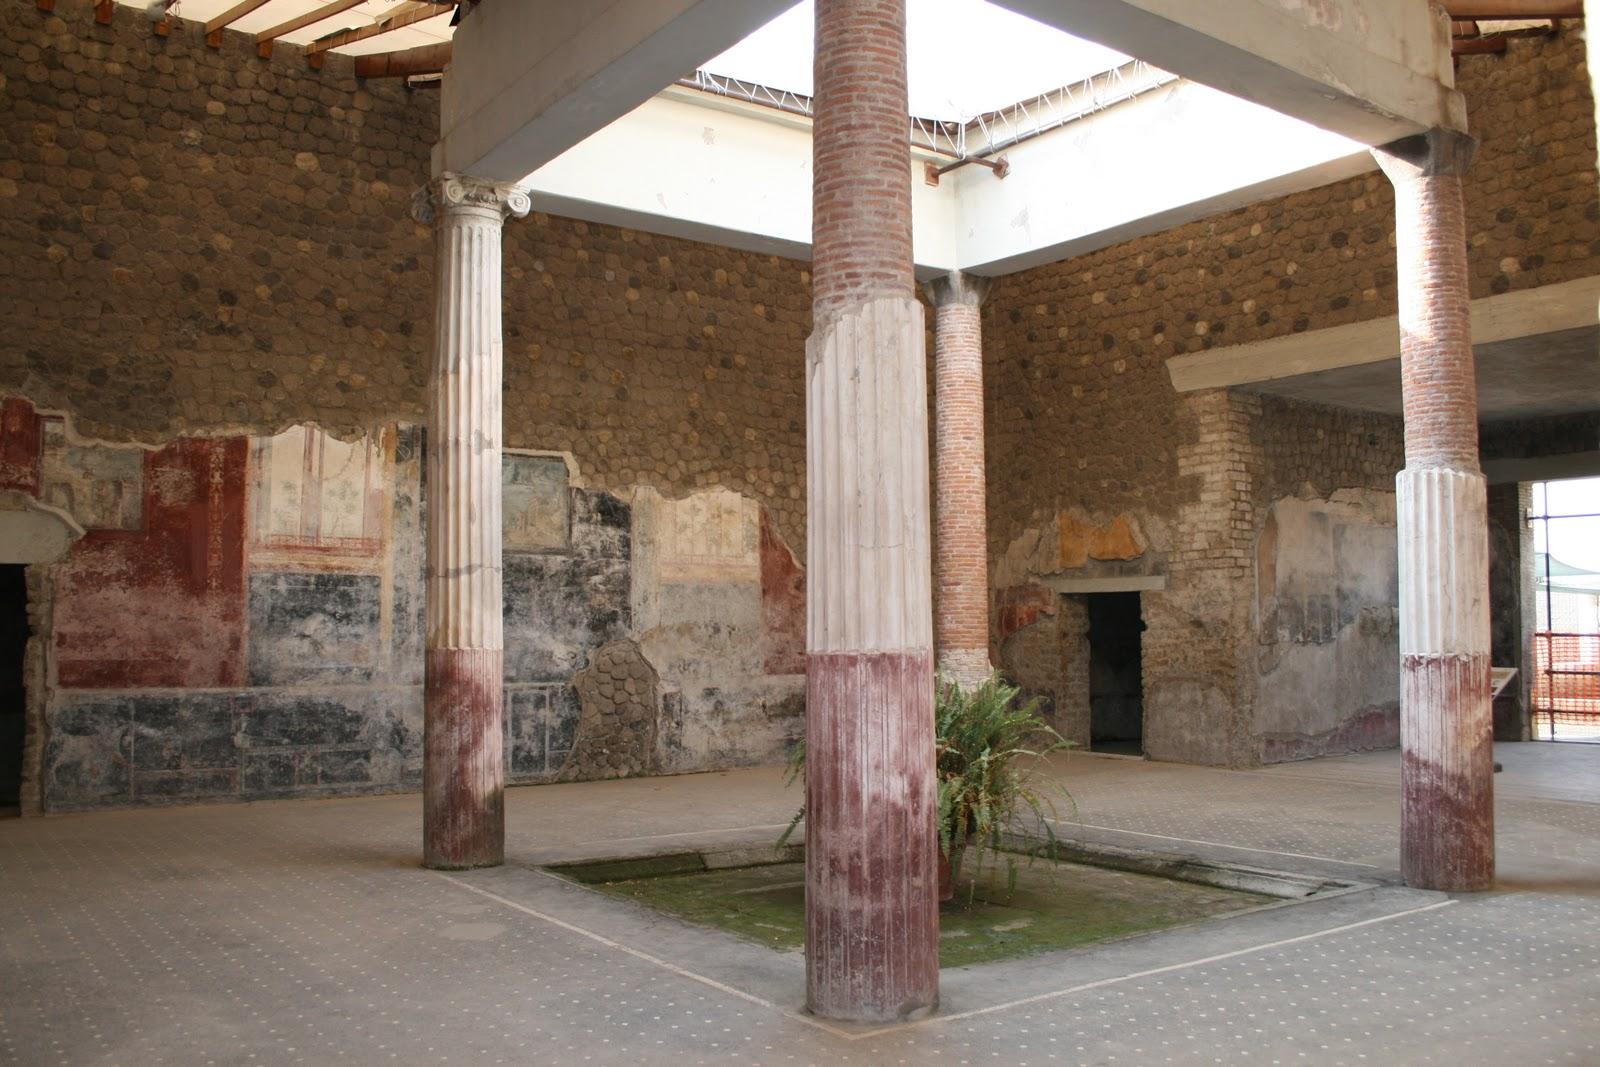 Domvs romana atrio centro activo del hogar romano for Atrio dentro casa